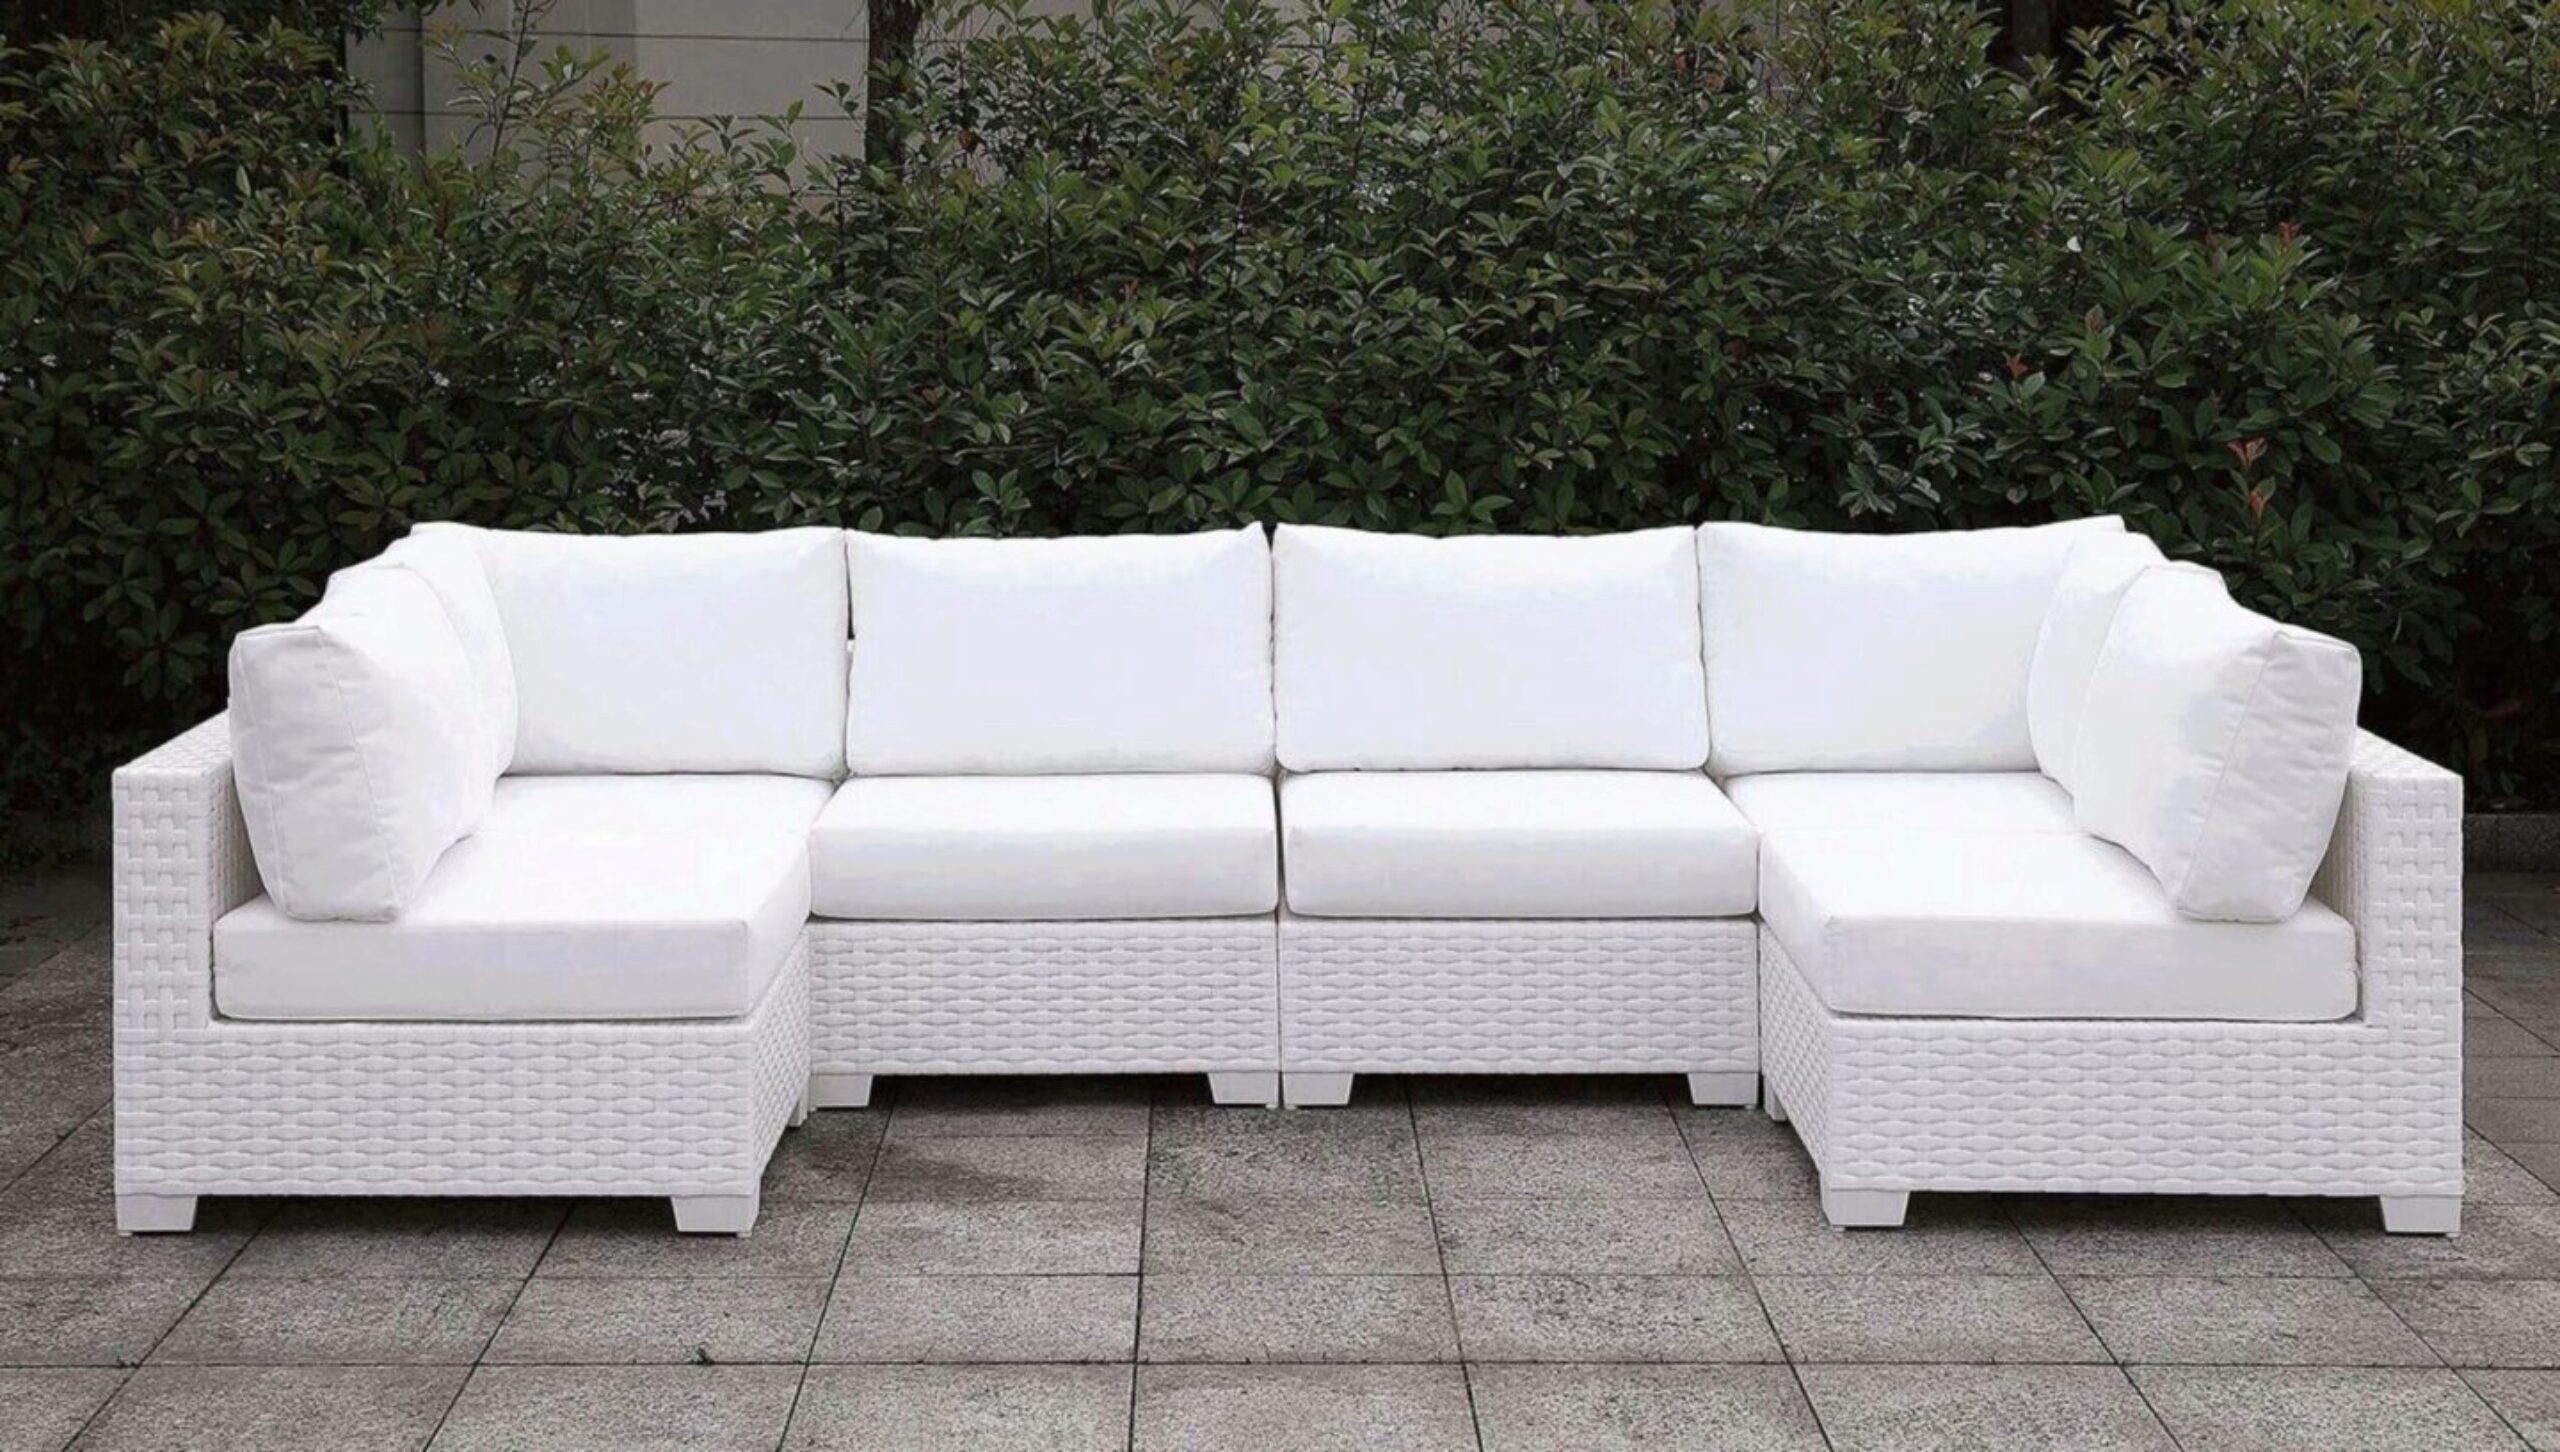 furniture of america somani ii white wicker patio u shape sectional